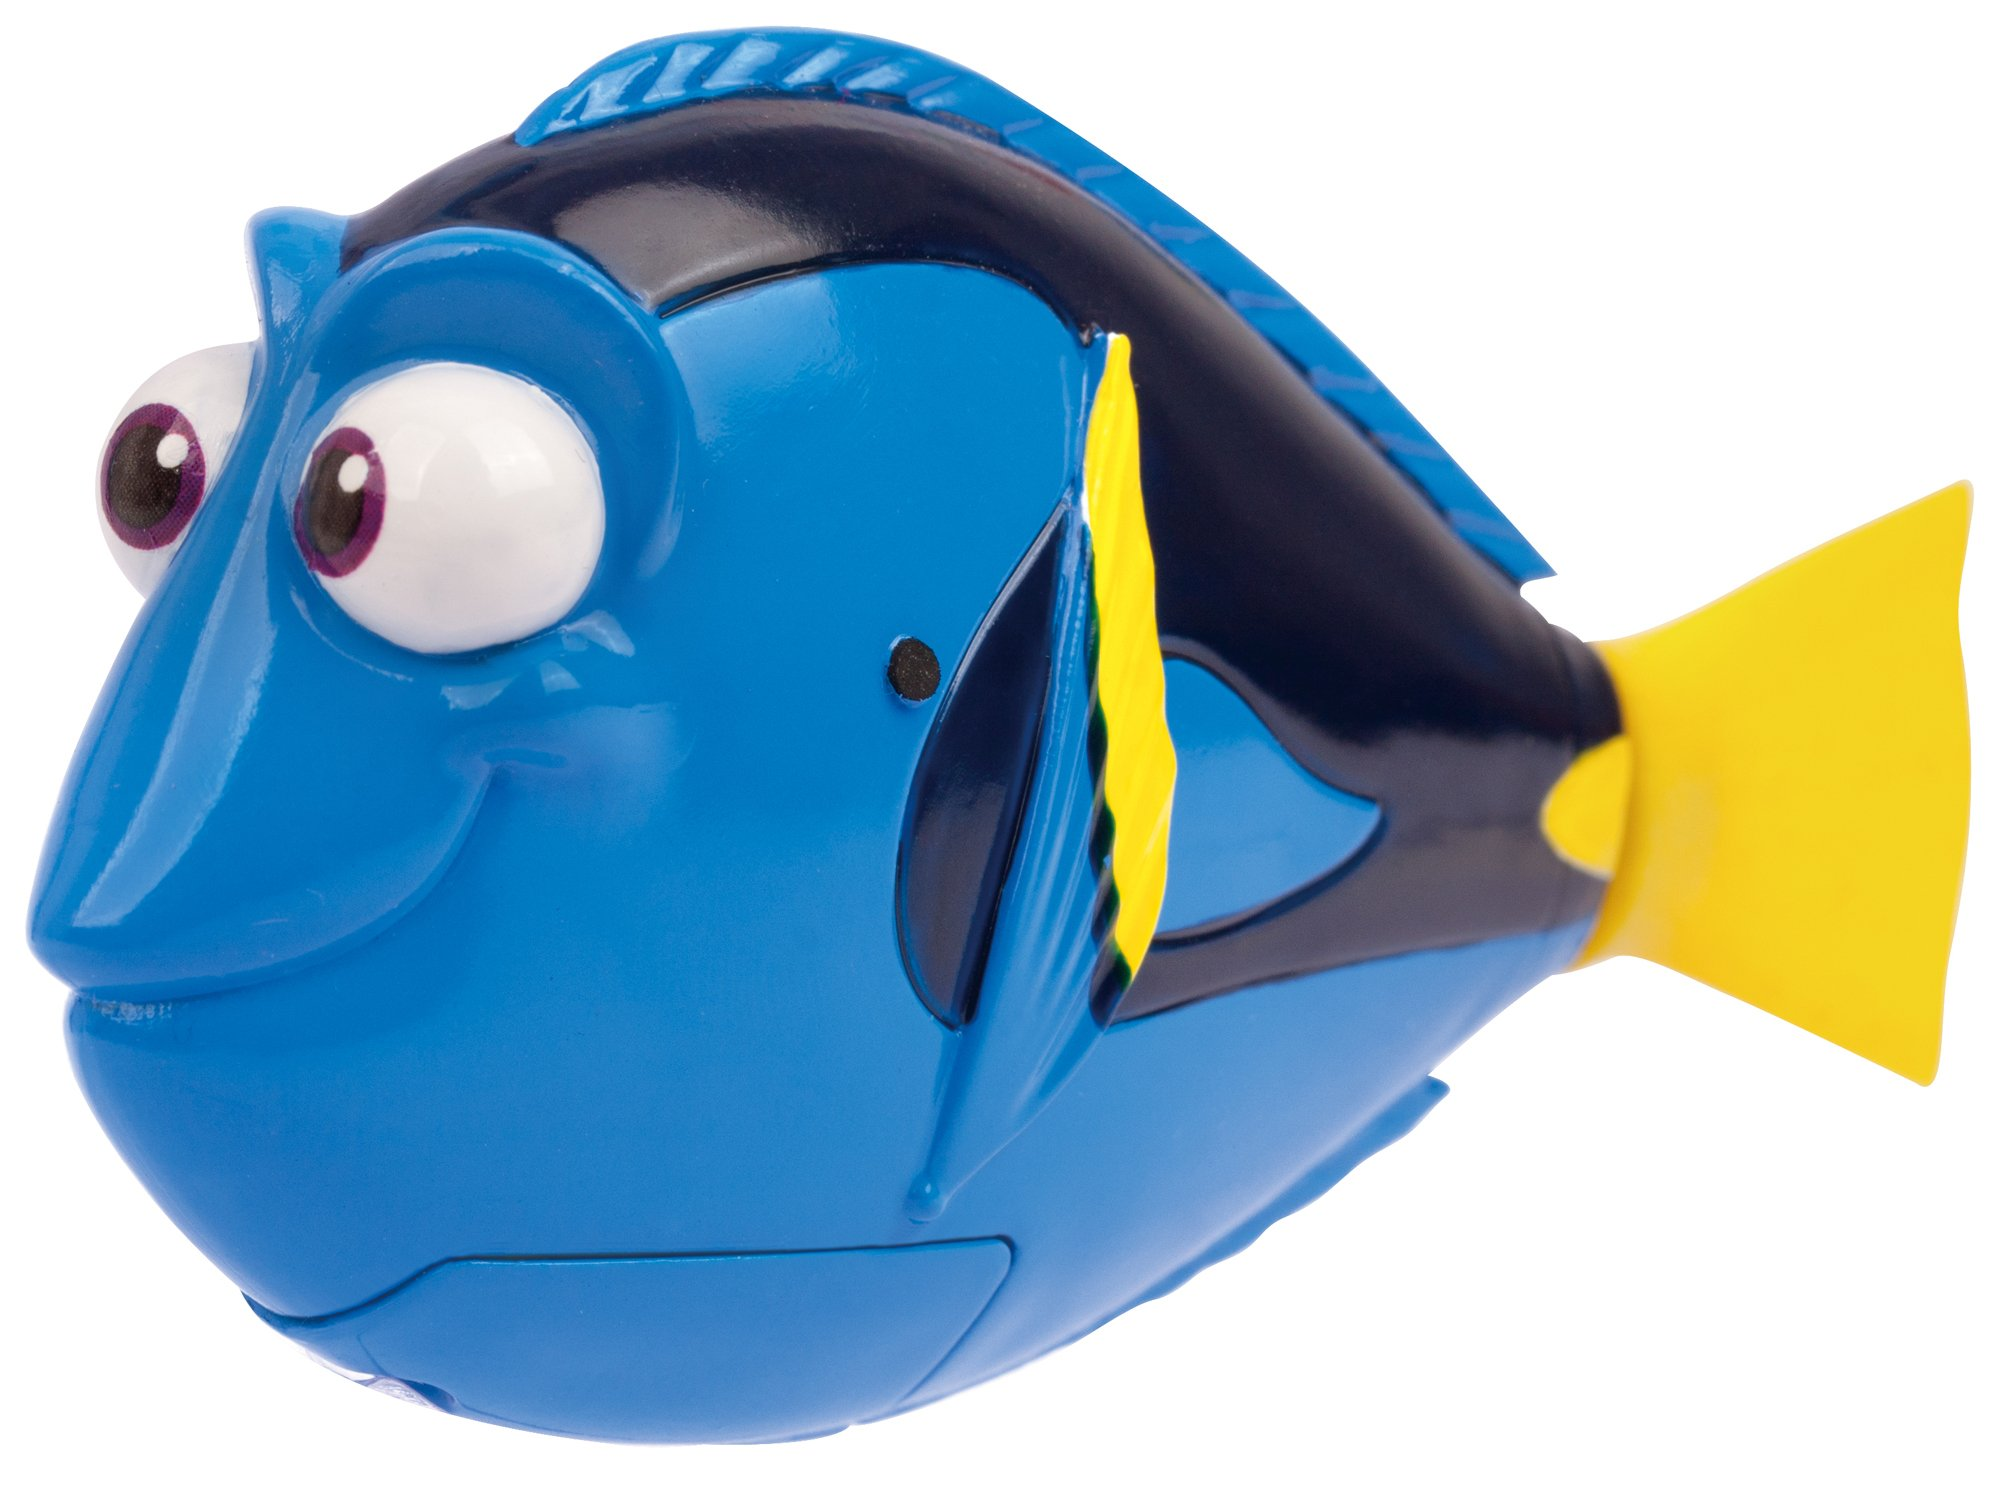 Zuru 22783 ''Finding Dory Robo Fish'' Playset by Zuru